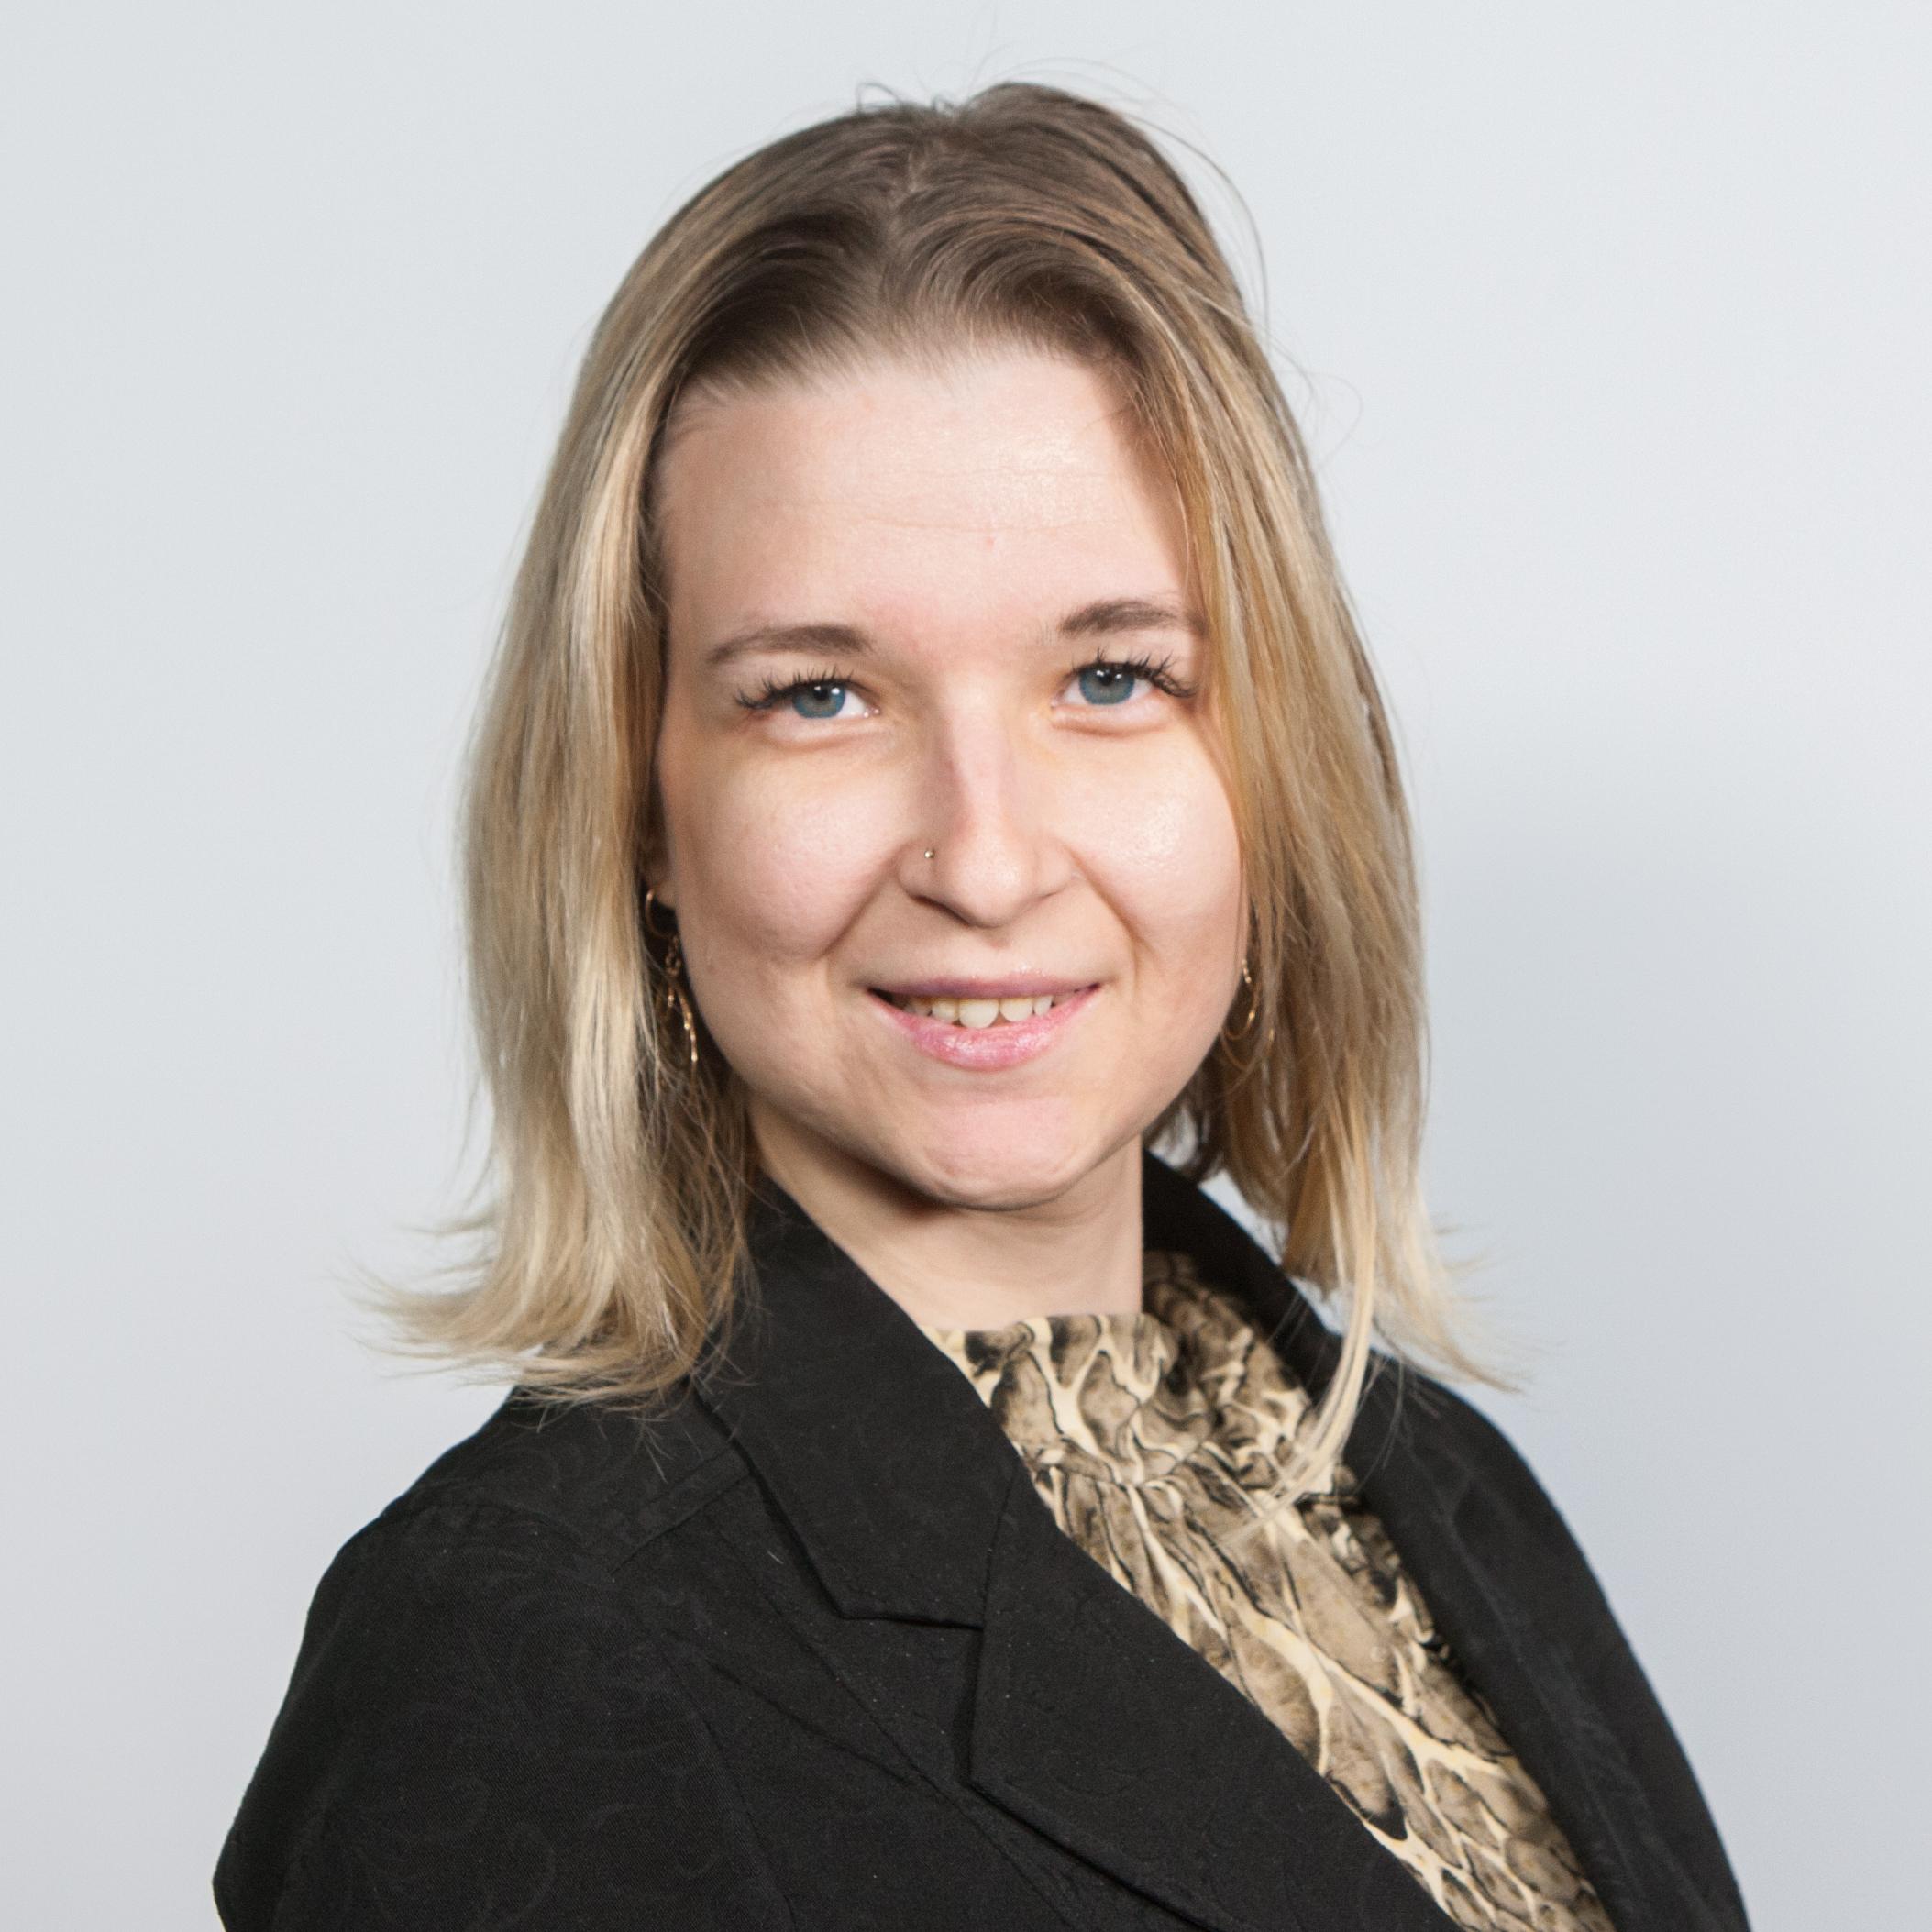 Халепа Ирина Юрьевна